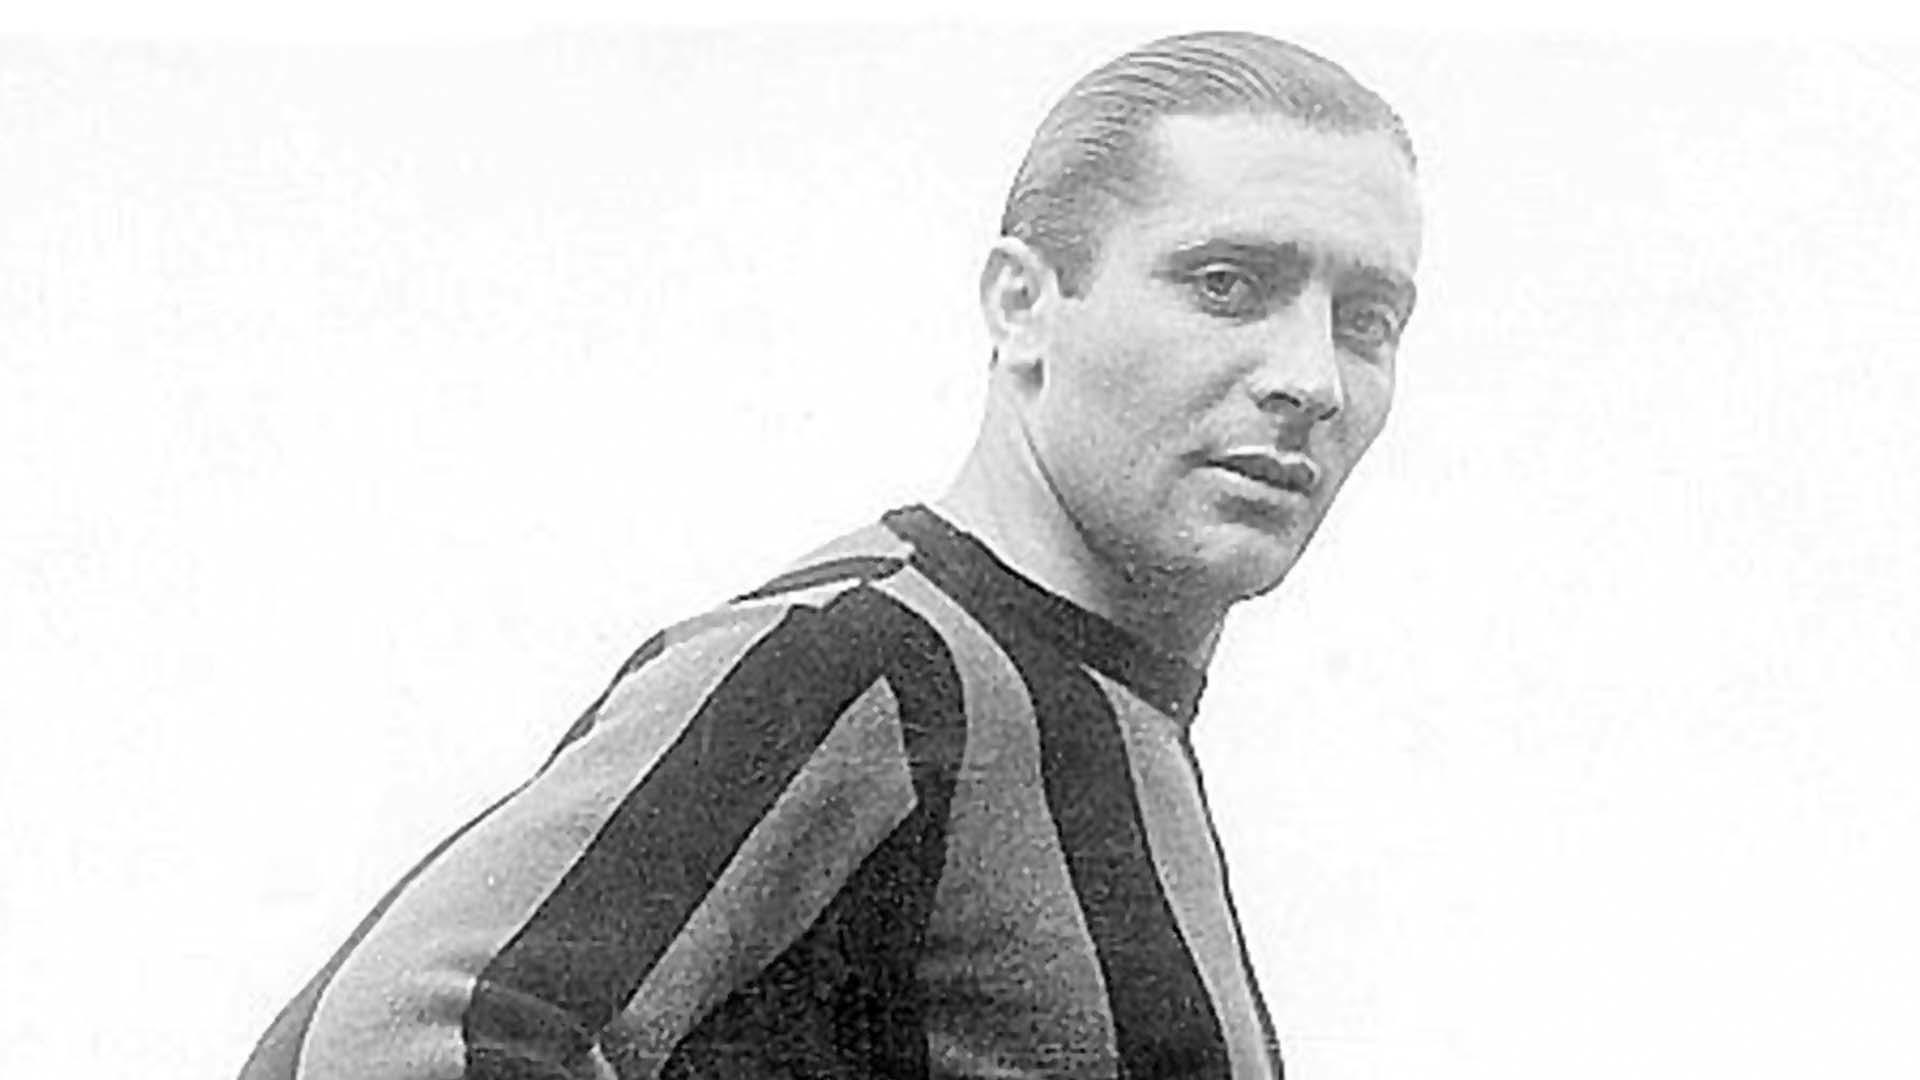 melhores jogadore do campeonato italiano meazza